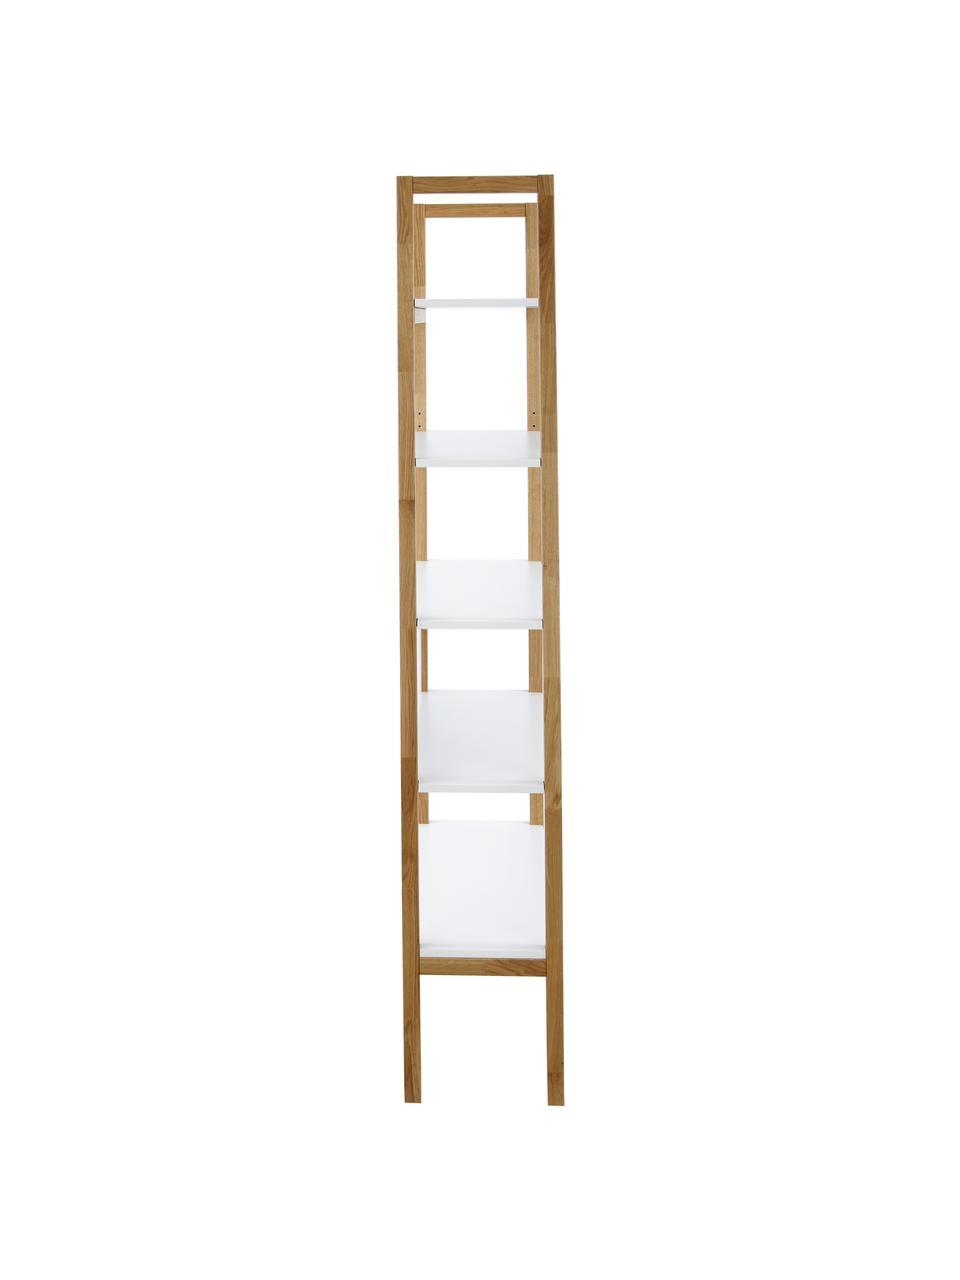 Standregal Farringdon mit Rahmen aus Eichenholz, Rahmen: Eichenholz, massiv, Weiß, Eichenholz, 90 x 185 cm